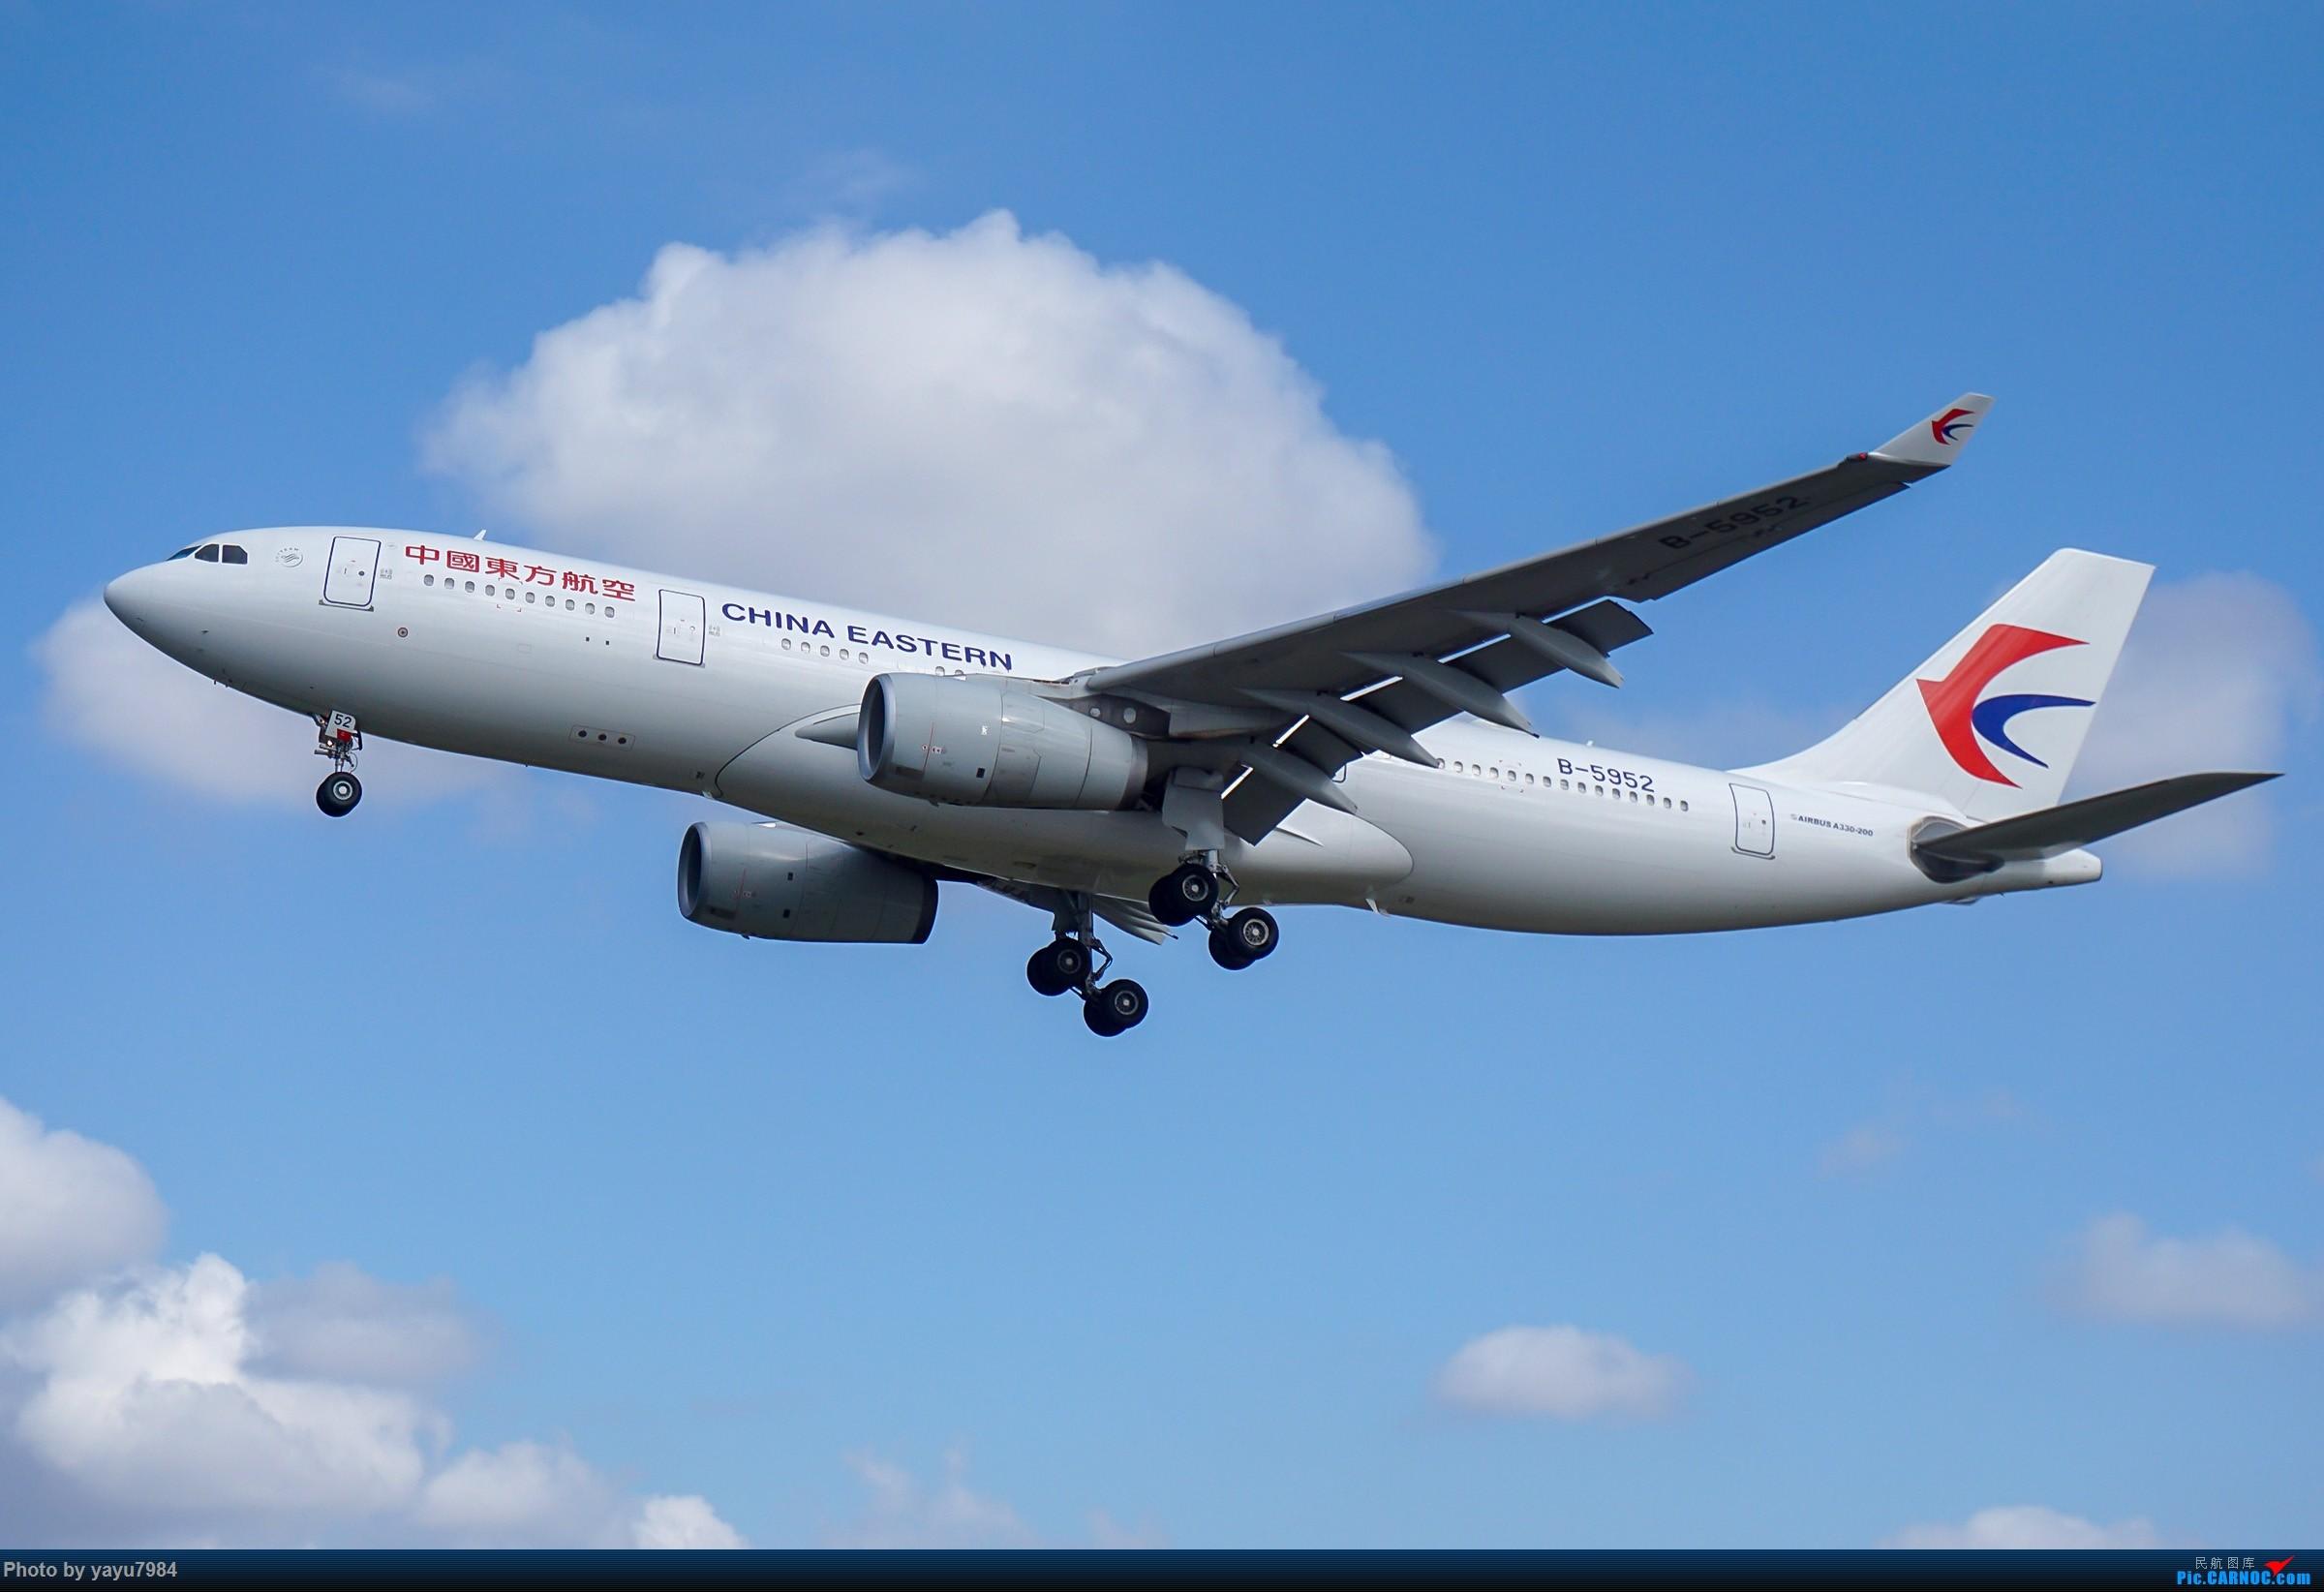 Re:[原创][SYD] 东航天合332,雪绒花343,华航蓝鹊,以及其他日常货 AIRBUS A330-200 B-5952 澳大利亚悉尼金斯福德·史密斯机场